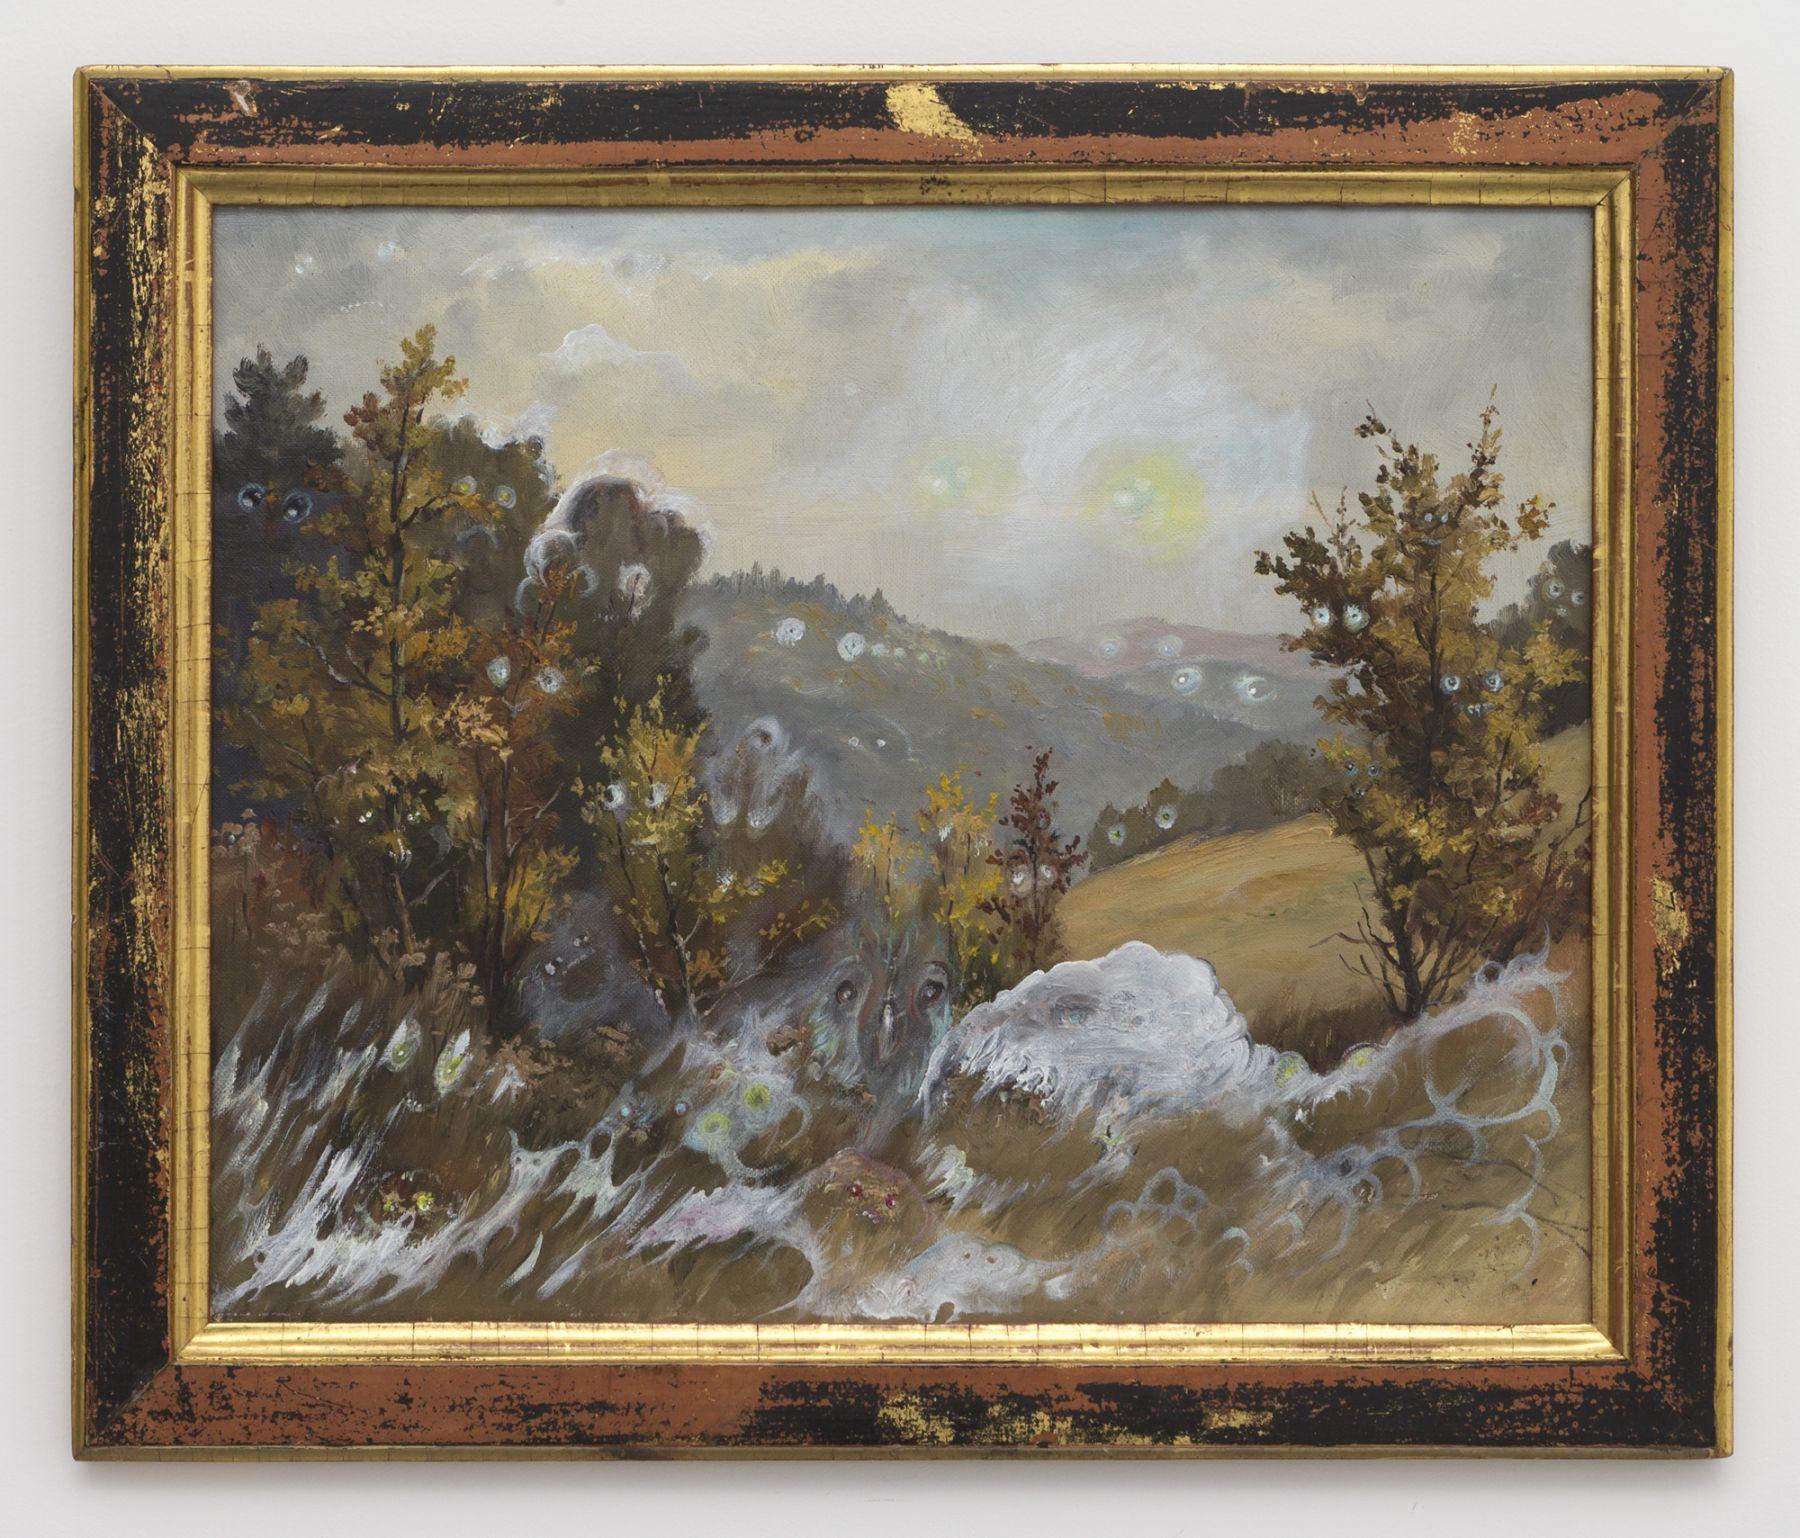 Vidya Gastaldon, Healing Painting (Chasse aux esprits)